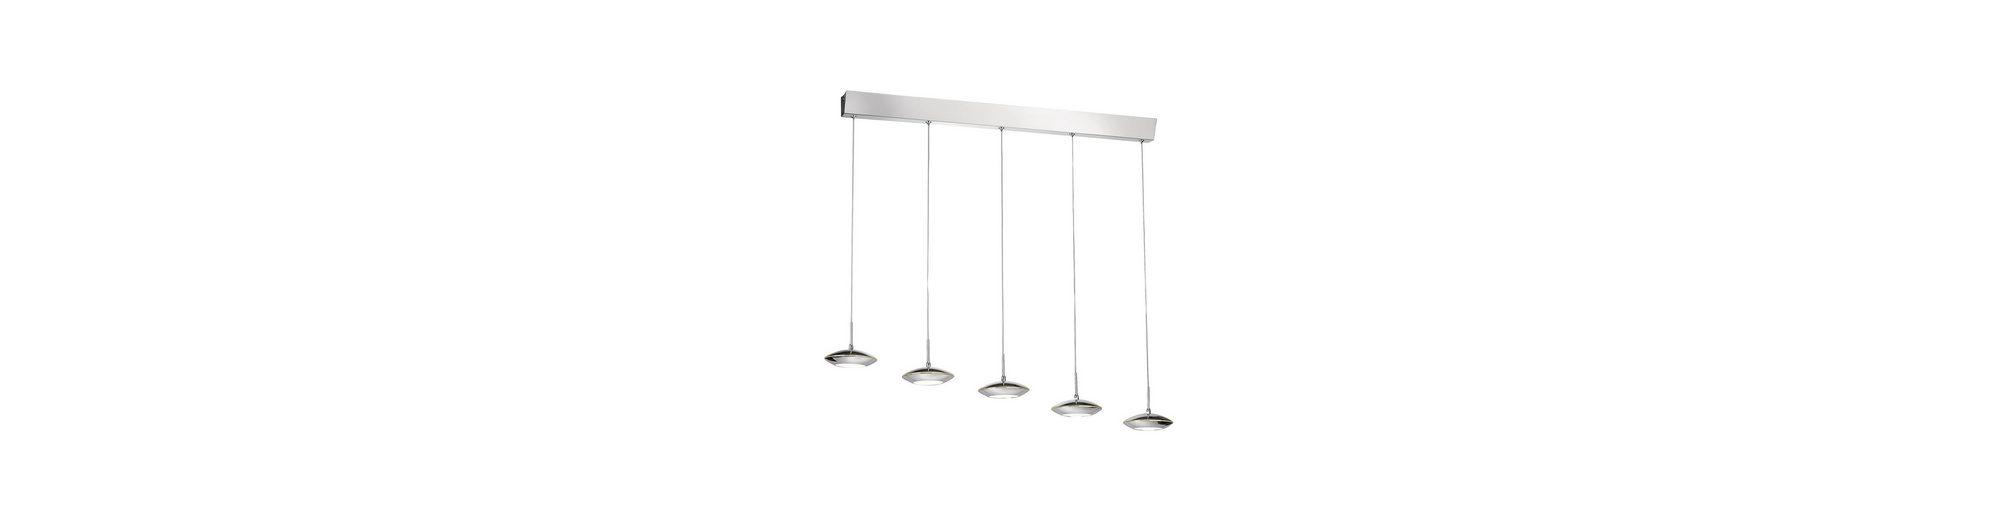 LED-Pendelleuchte, Paul Neuhaus